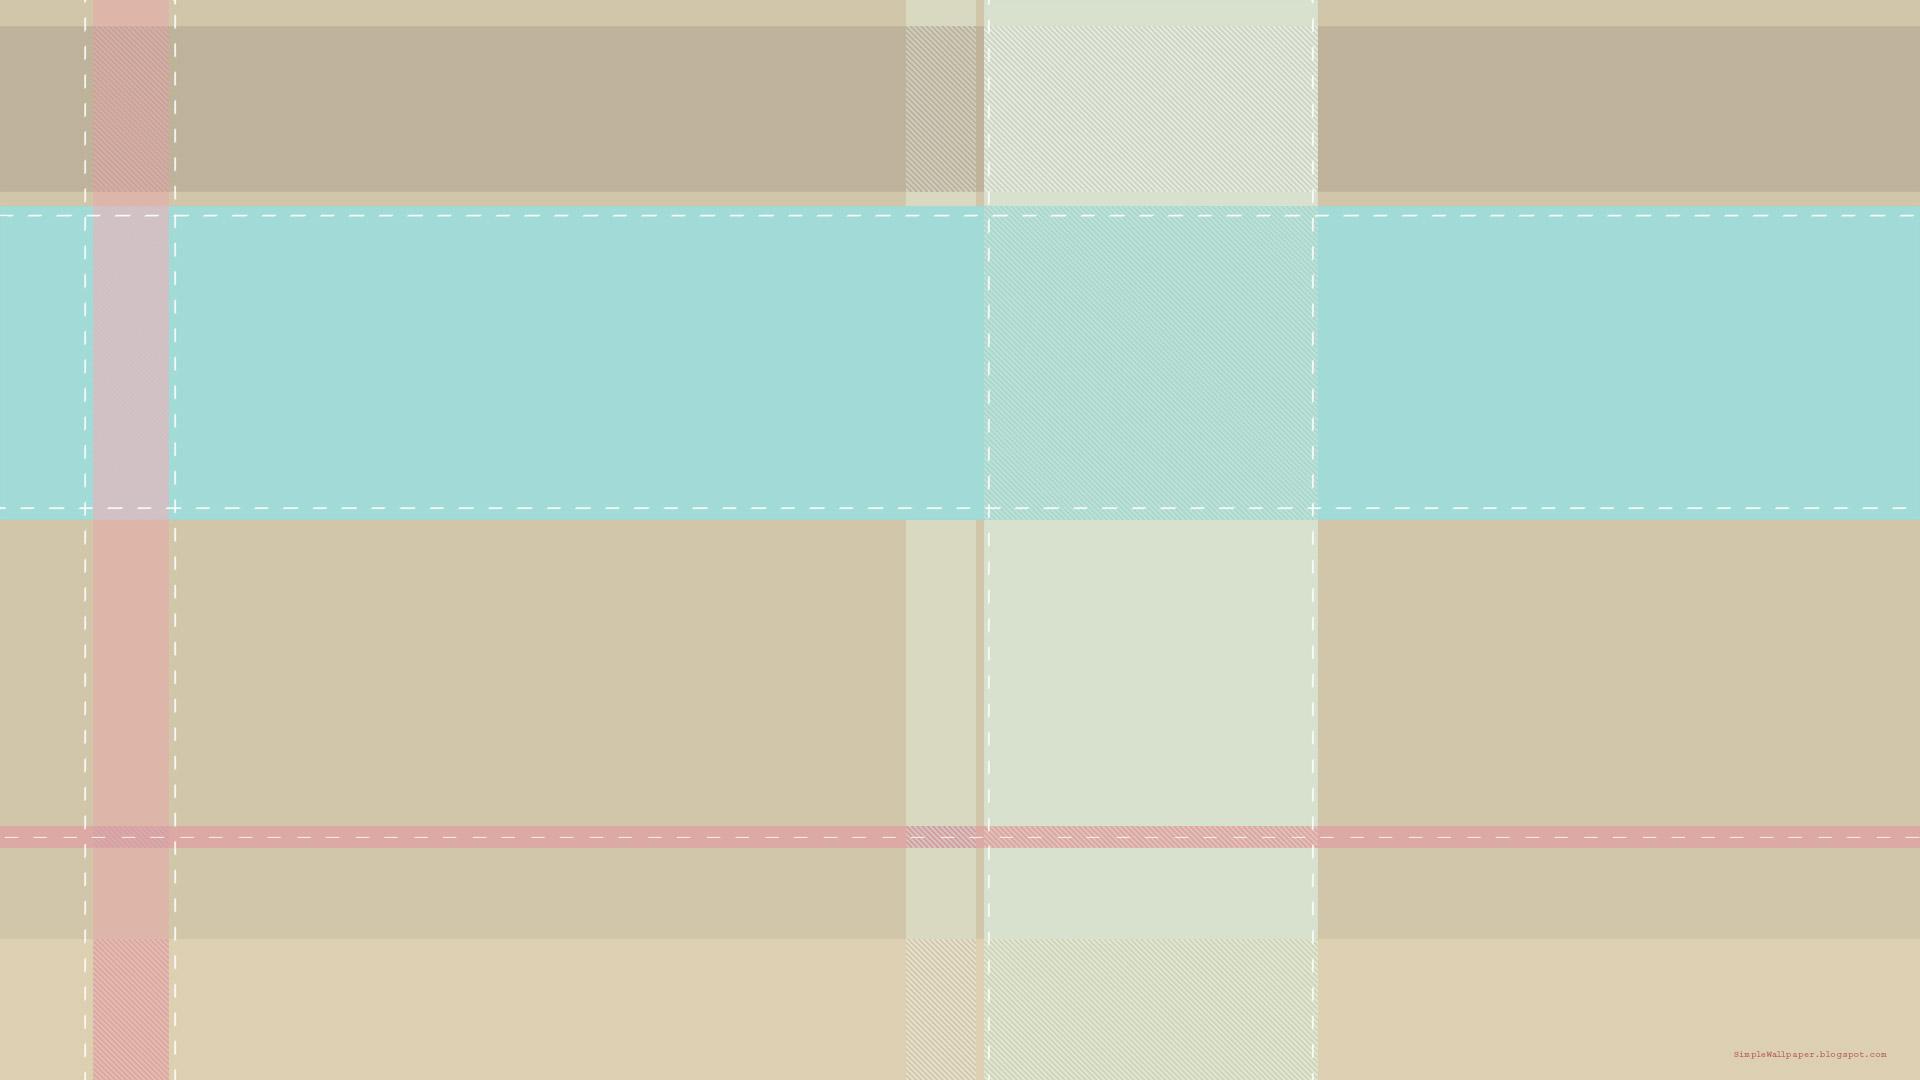 Simple Desktop Wallpaper Ugly Plaid Stitch